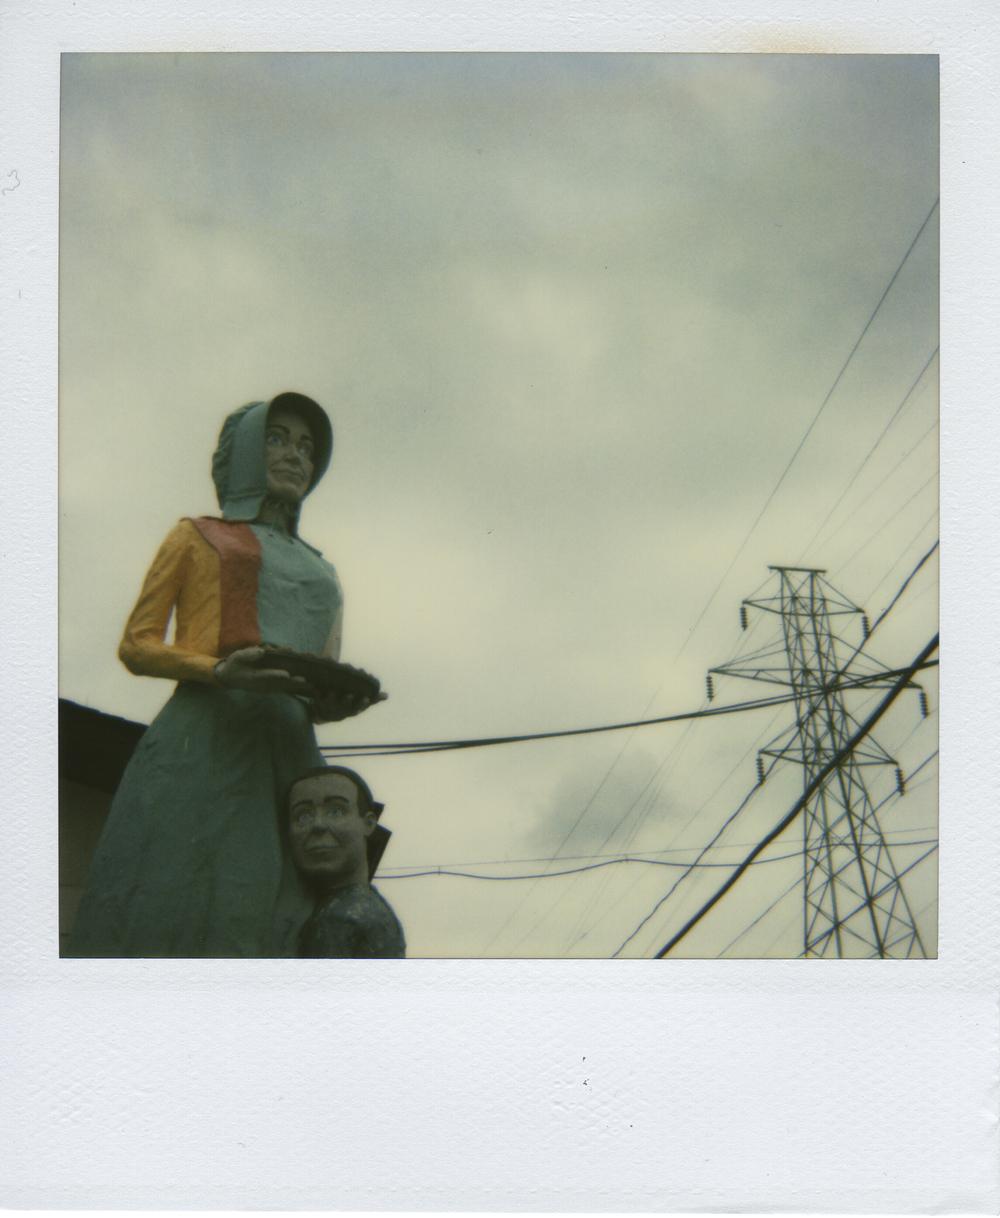 jlaurence-polaroid-131.jpg